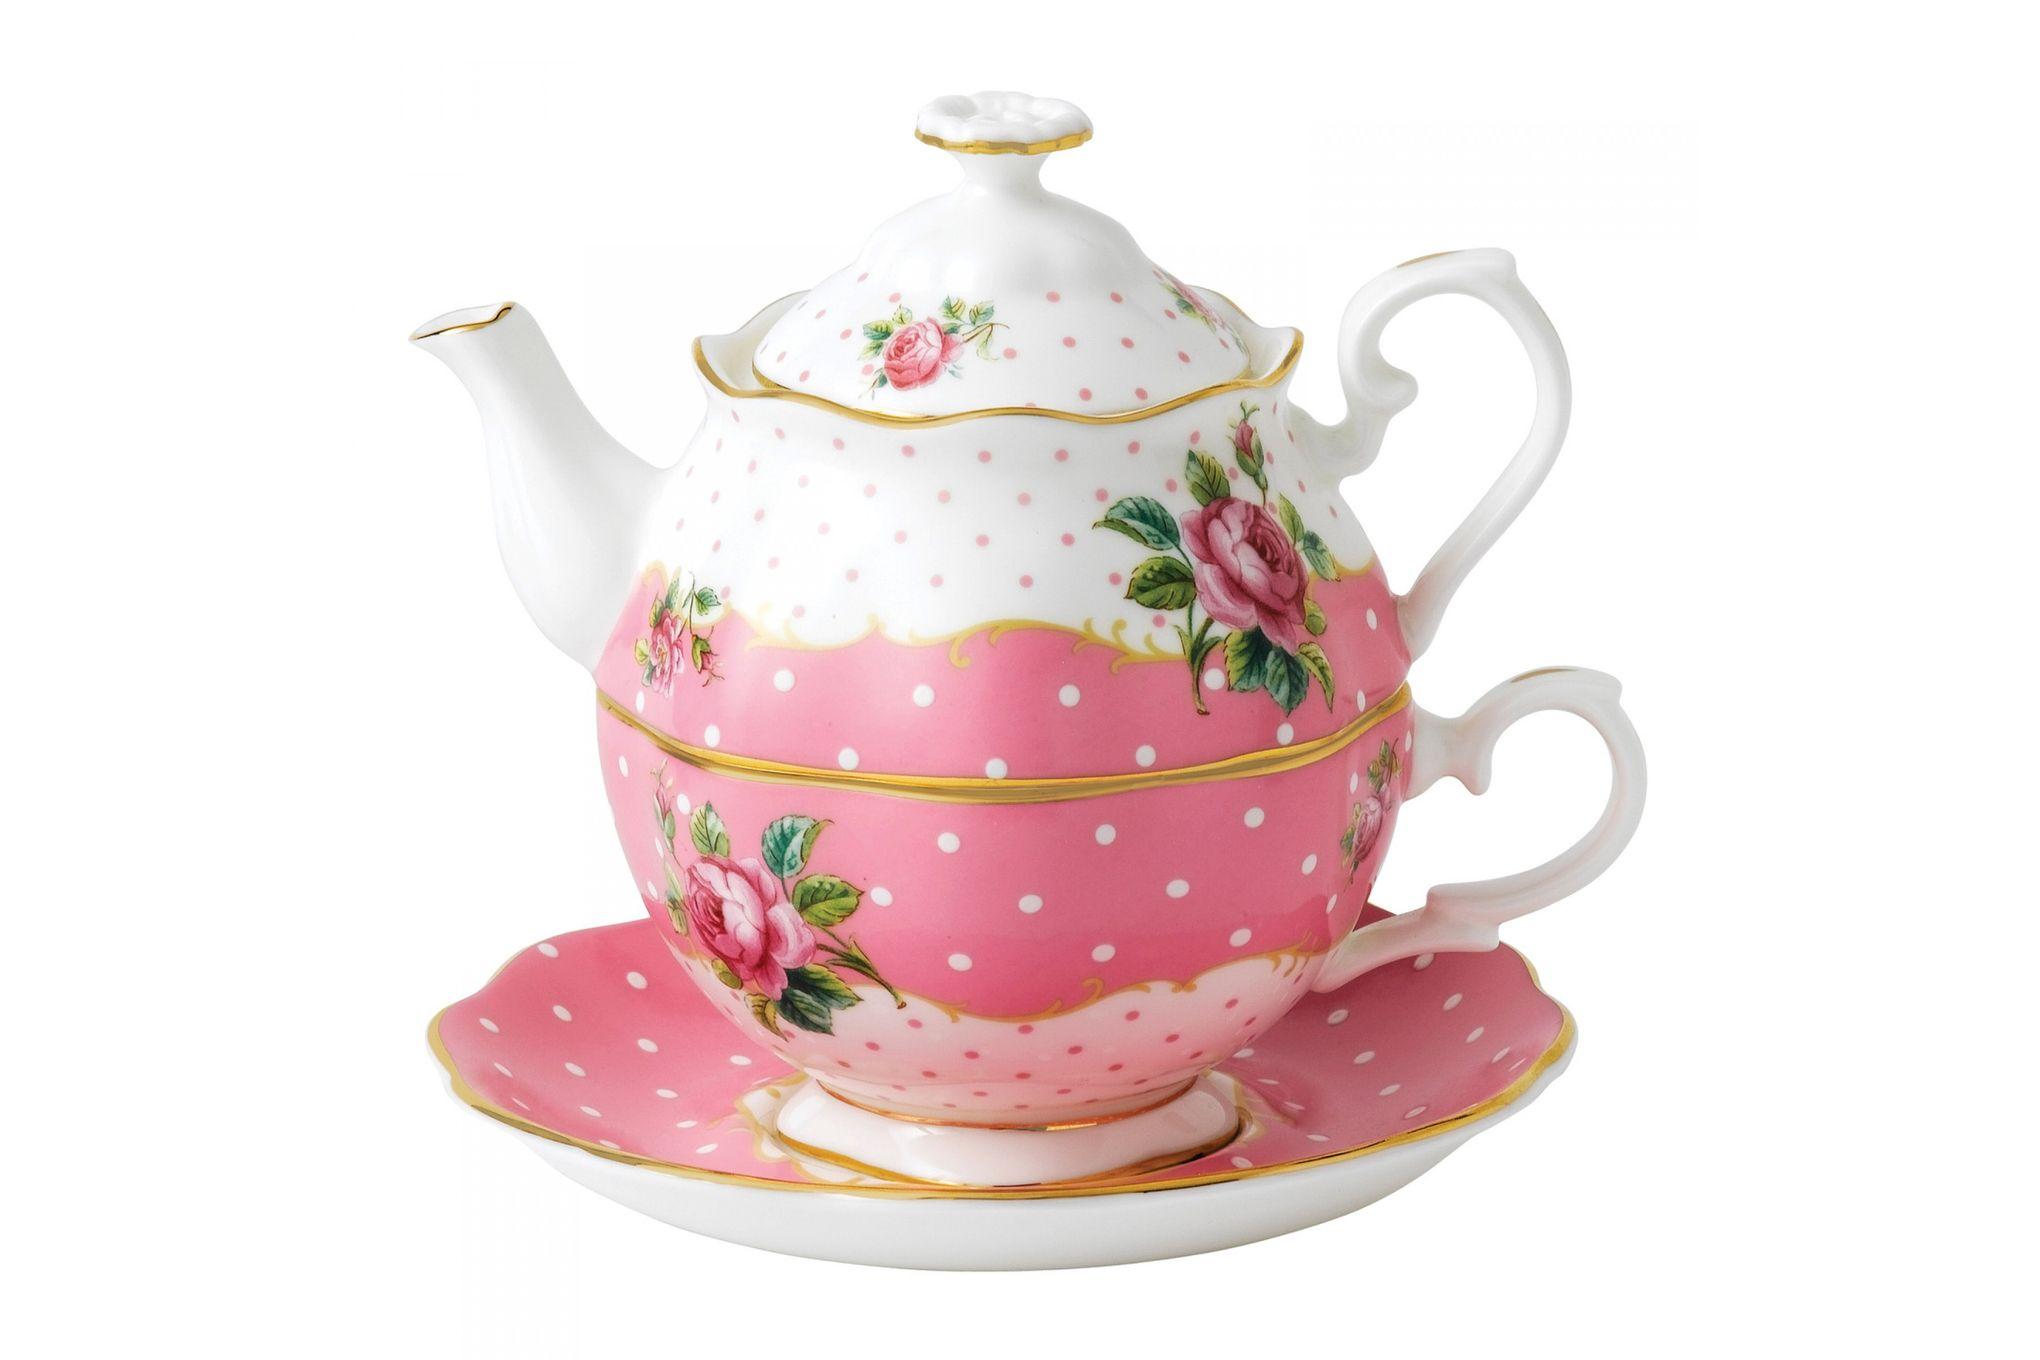 Royal Albert Cheeky Pink Tea For One Vintage Shape - Gift Boxed thumb 1